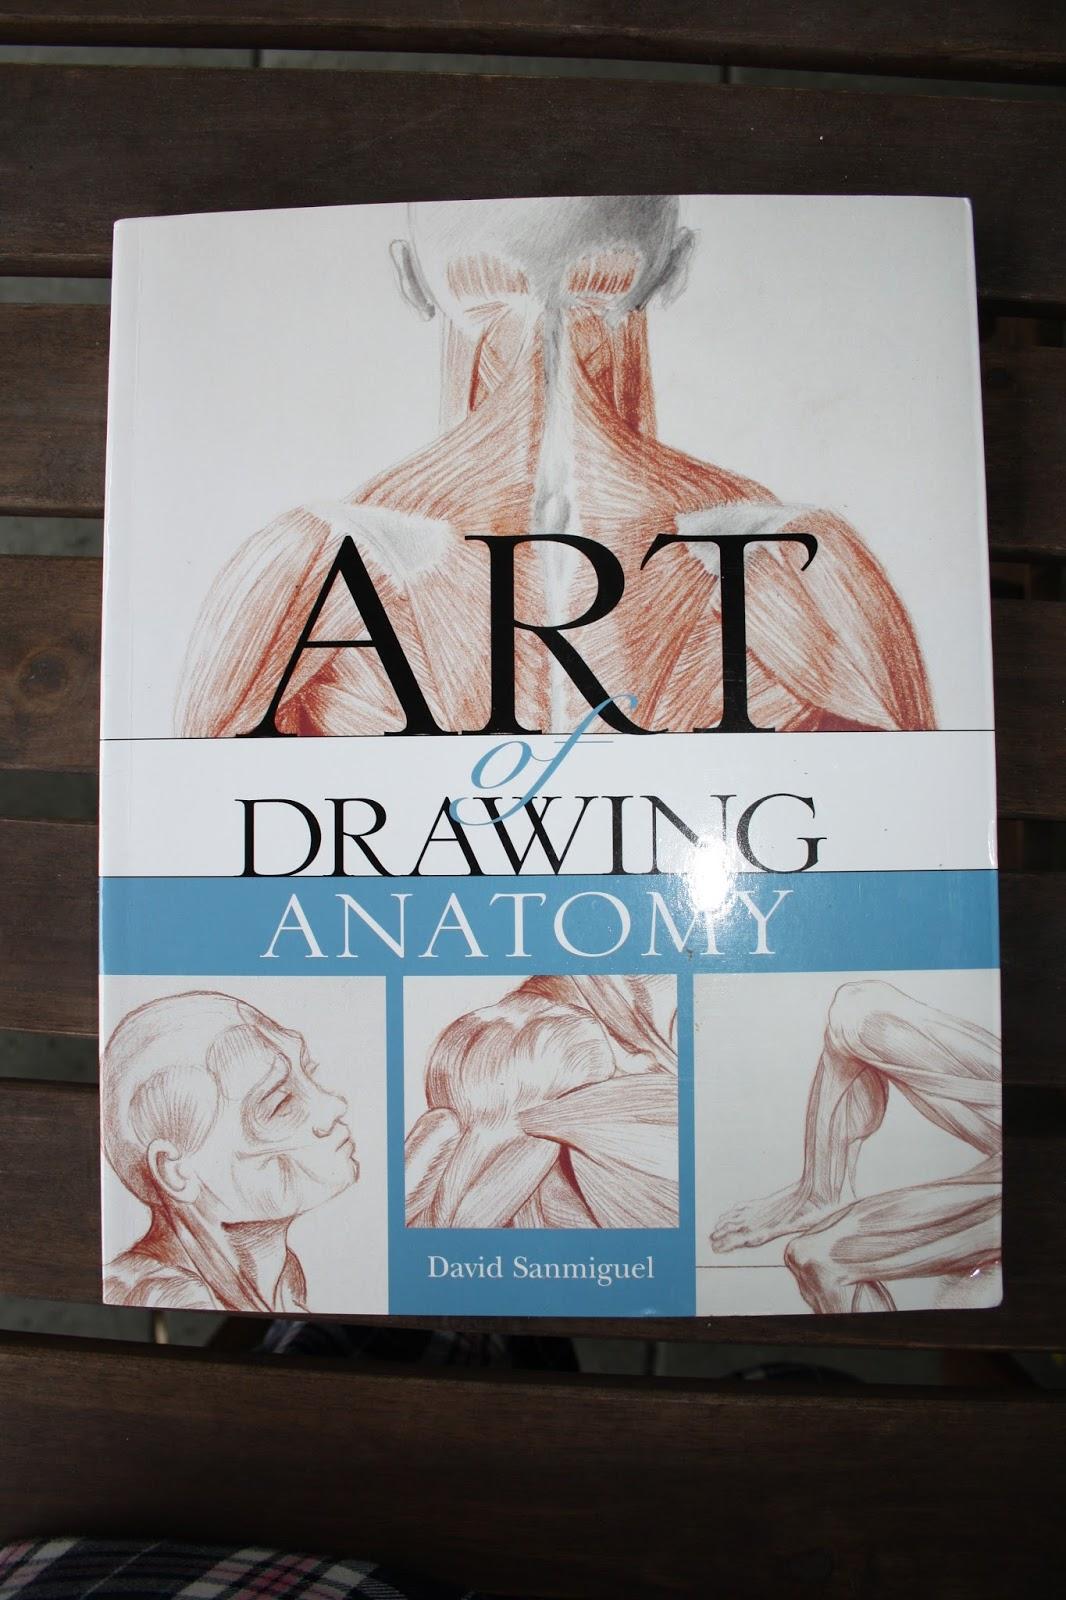 Anita Illustrated: Art of Drawing Anatomy by David Sanmiguel - book ...